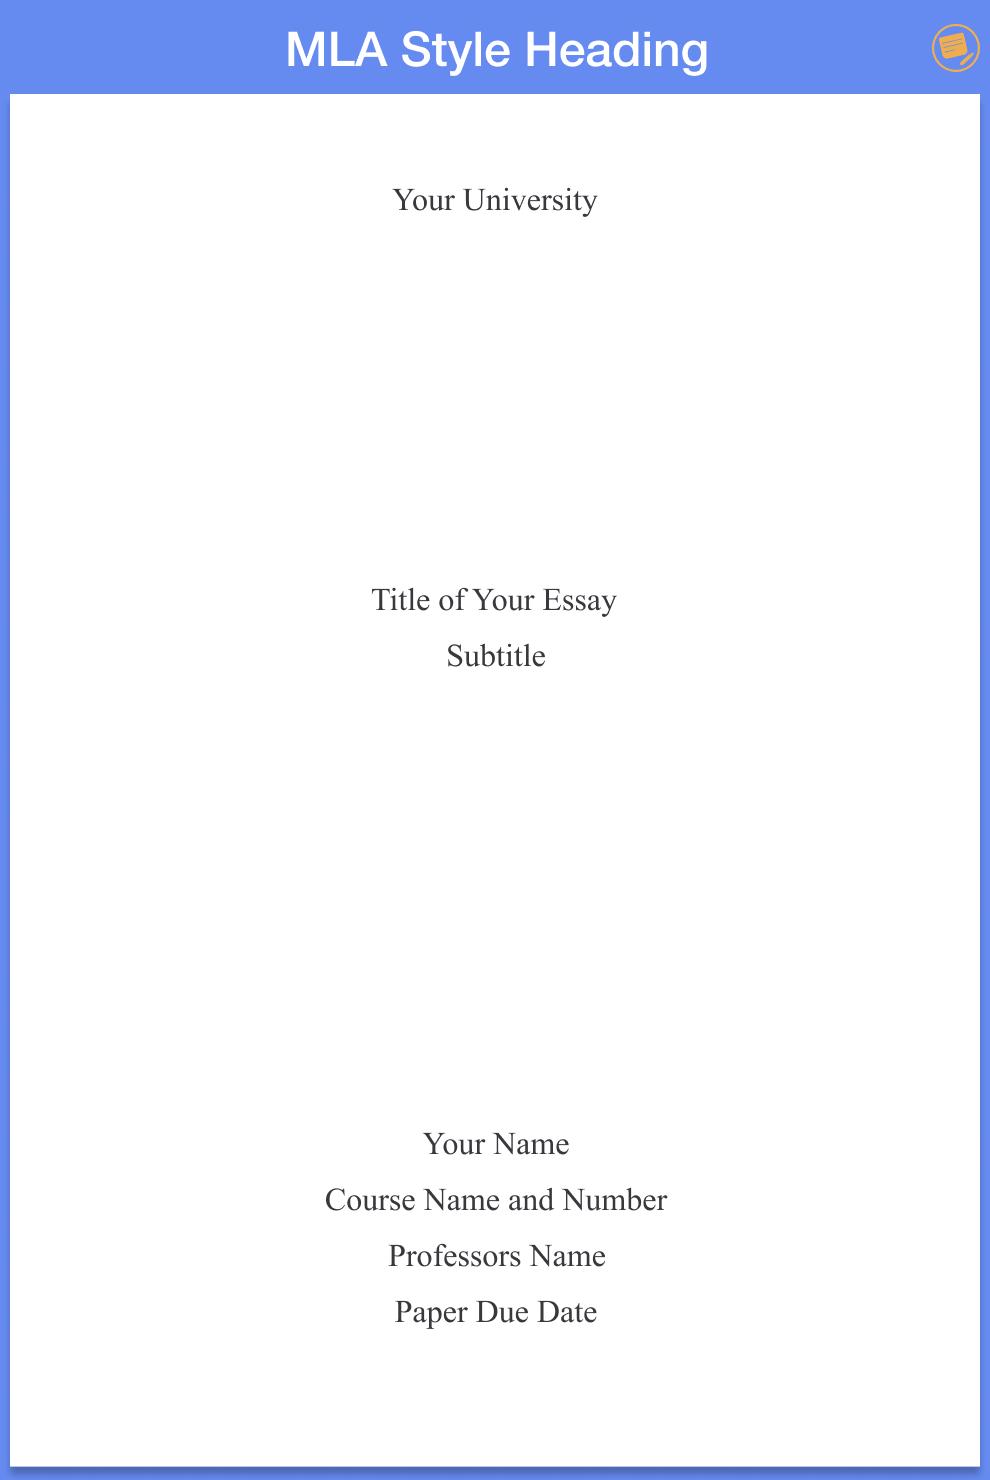 mla-title-page